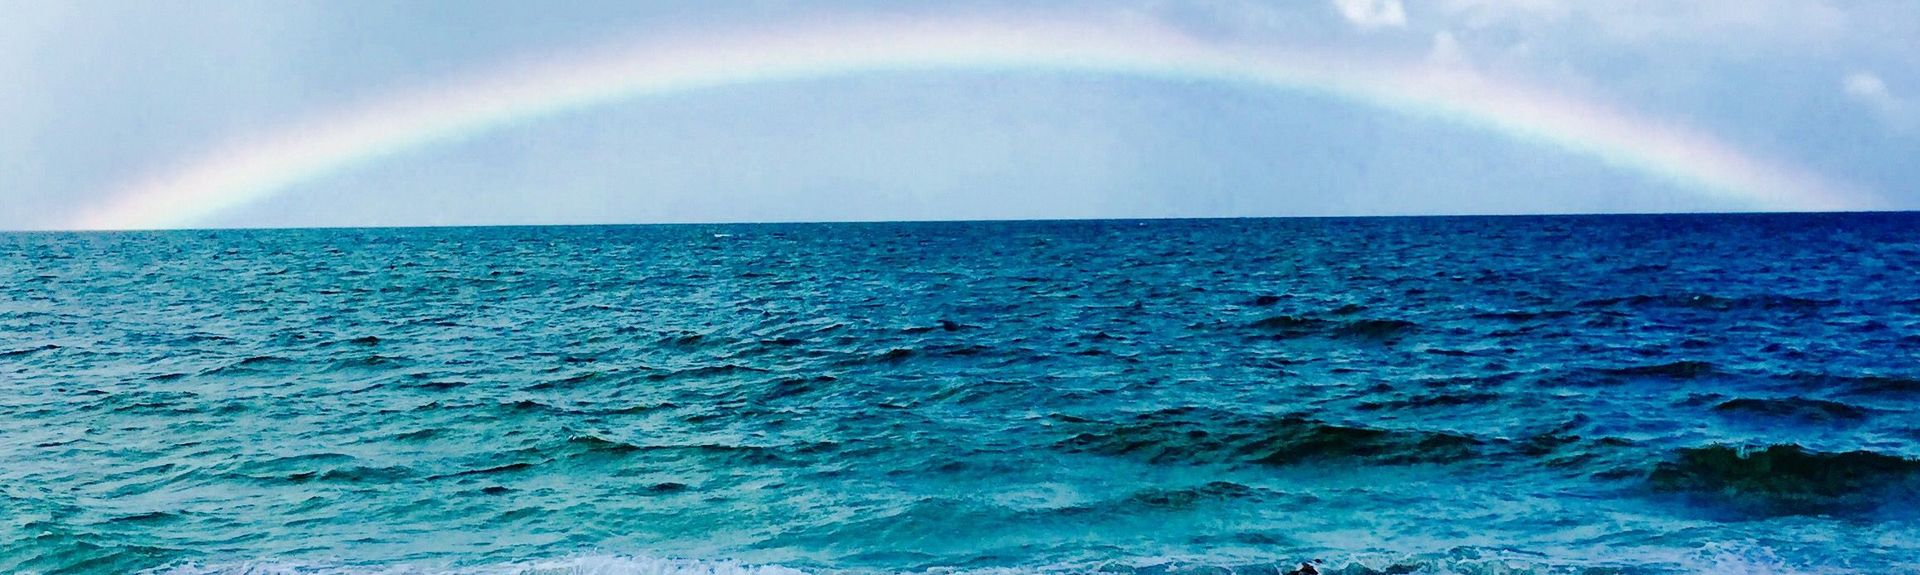 Captiva Beach, Captiva, Florida, United States of America